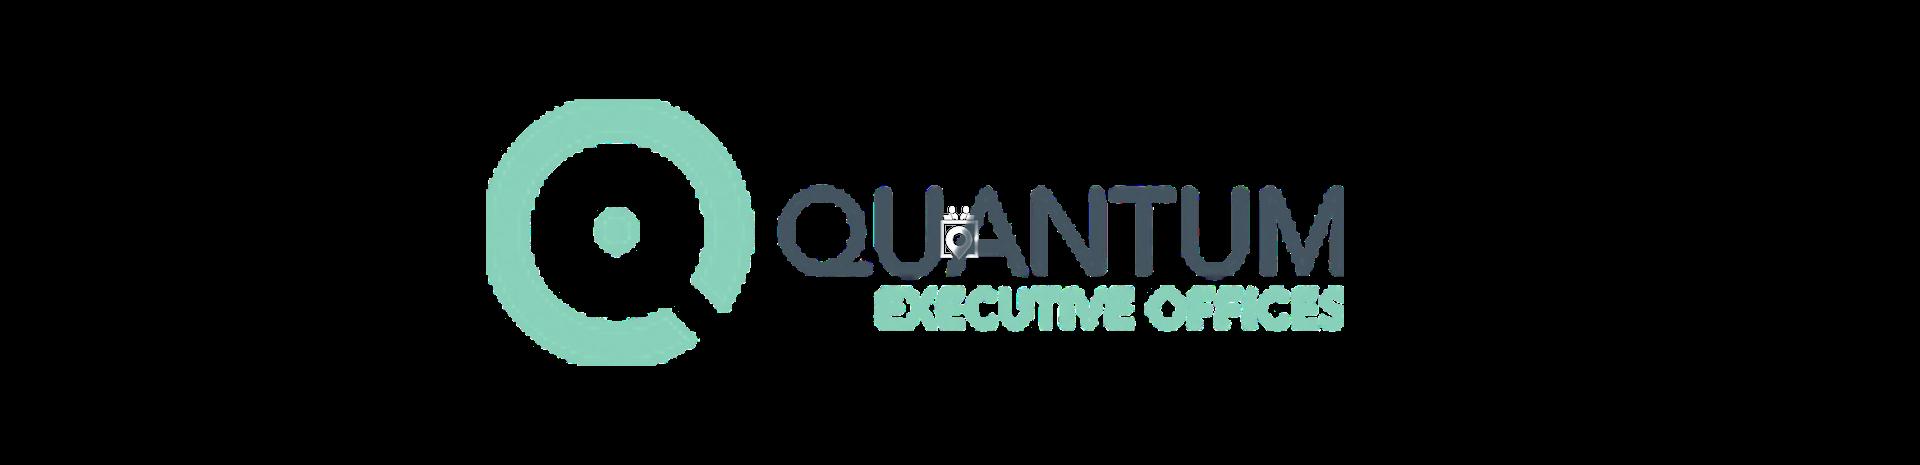 Quantum Executive Office, Miami - Book Online - Coworker